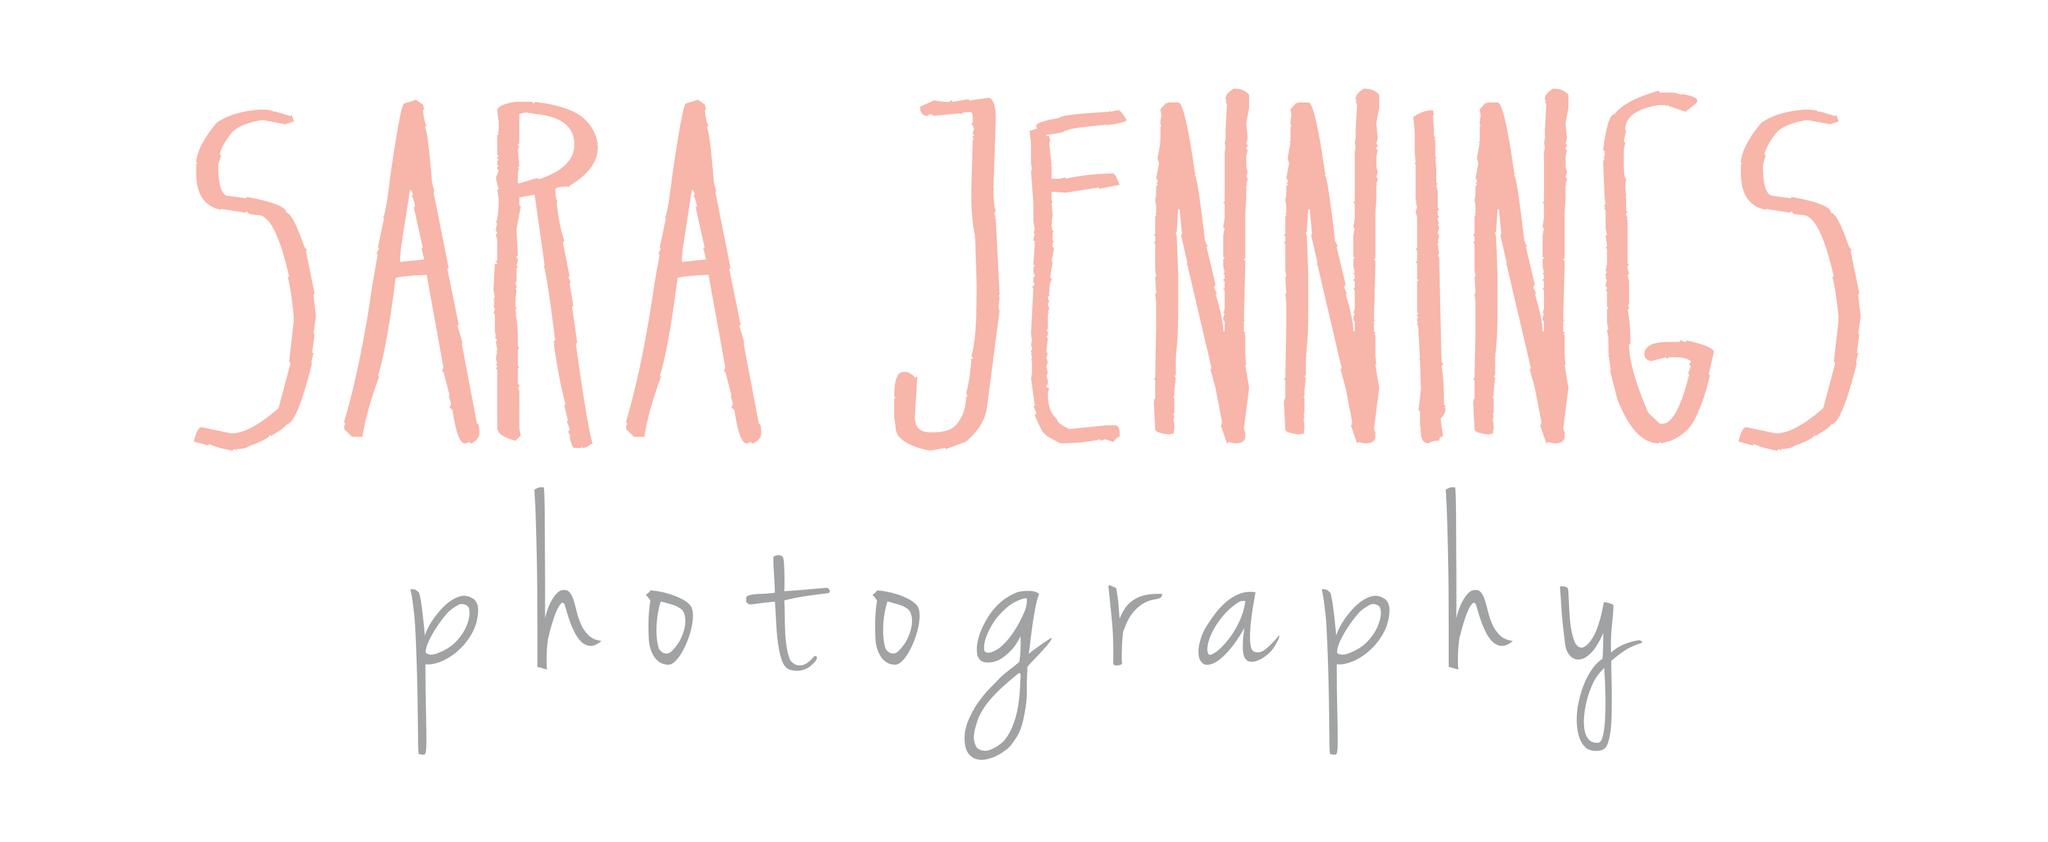 Sara Jennings